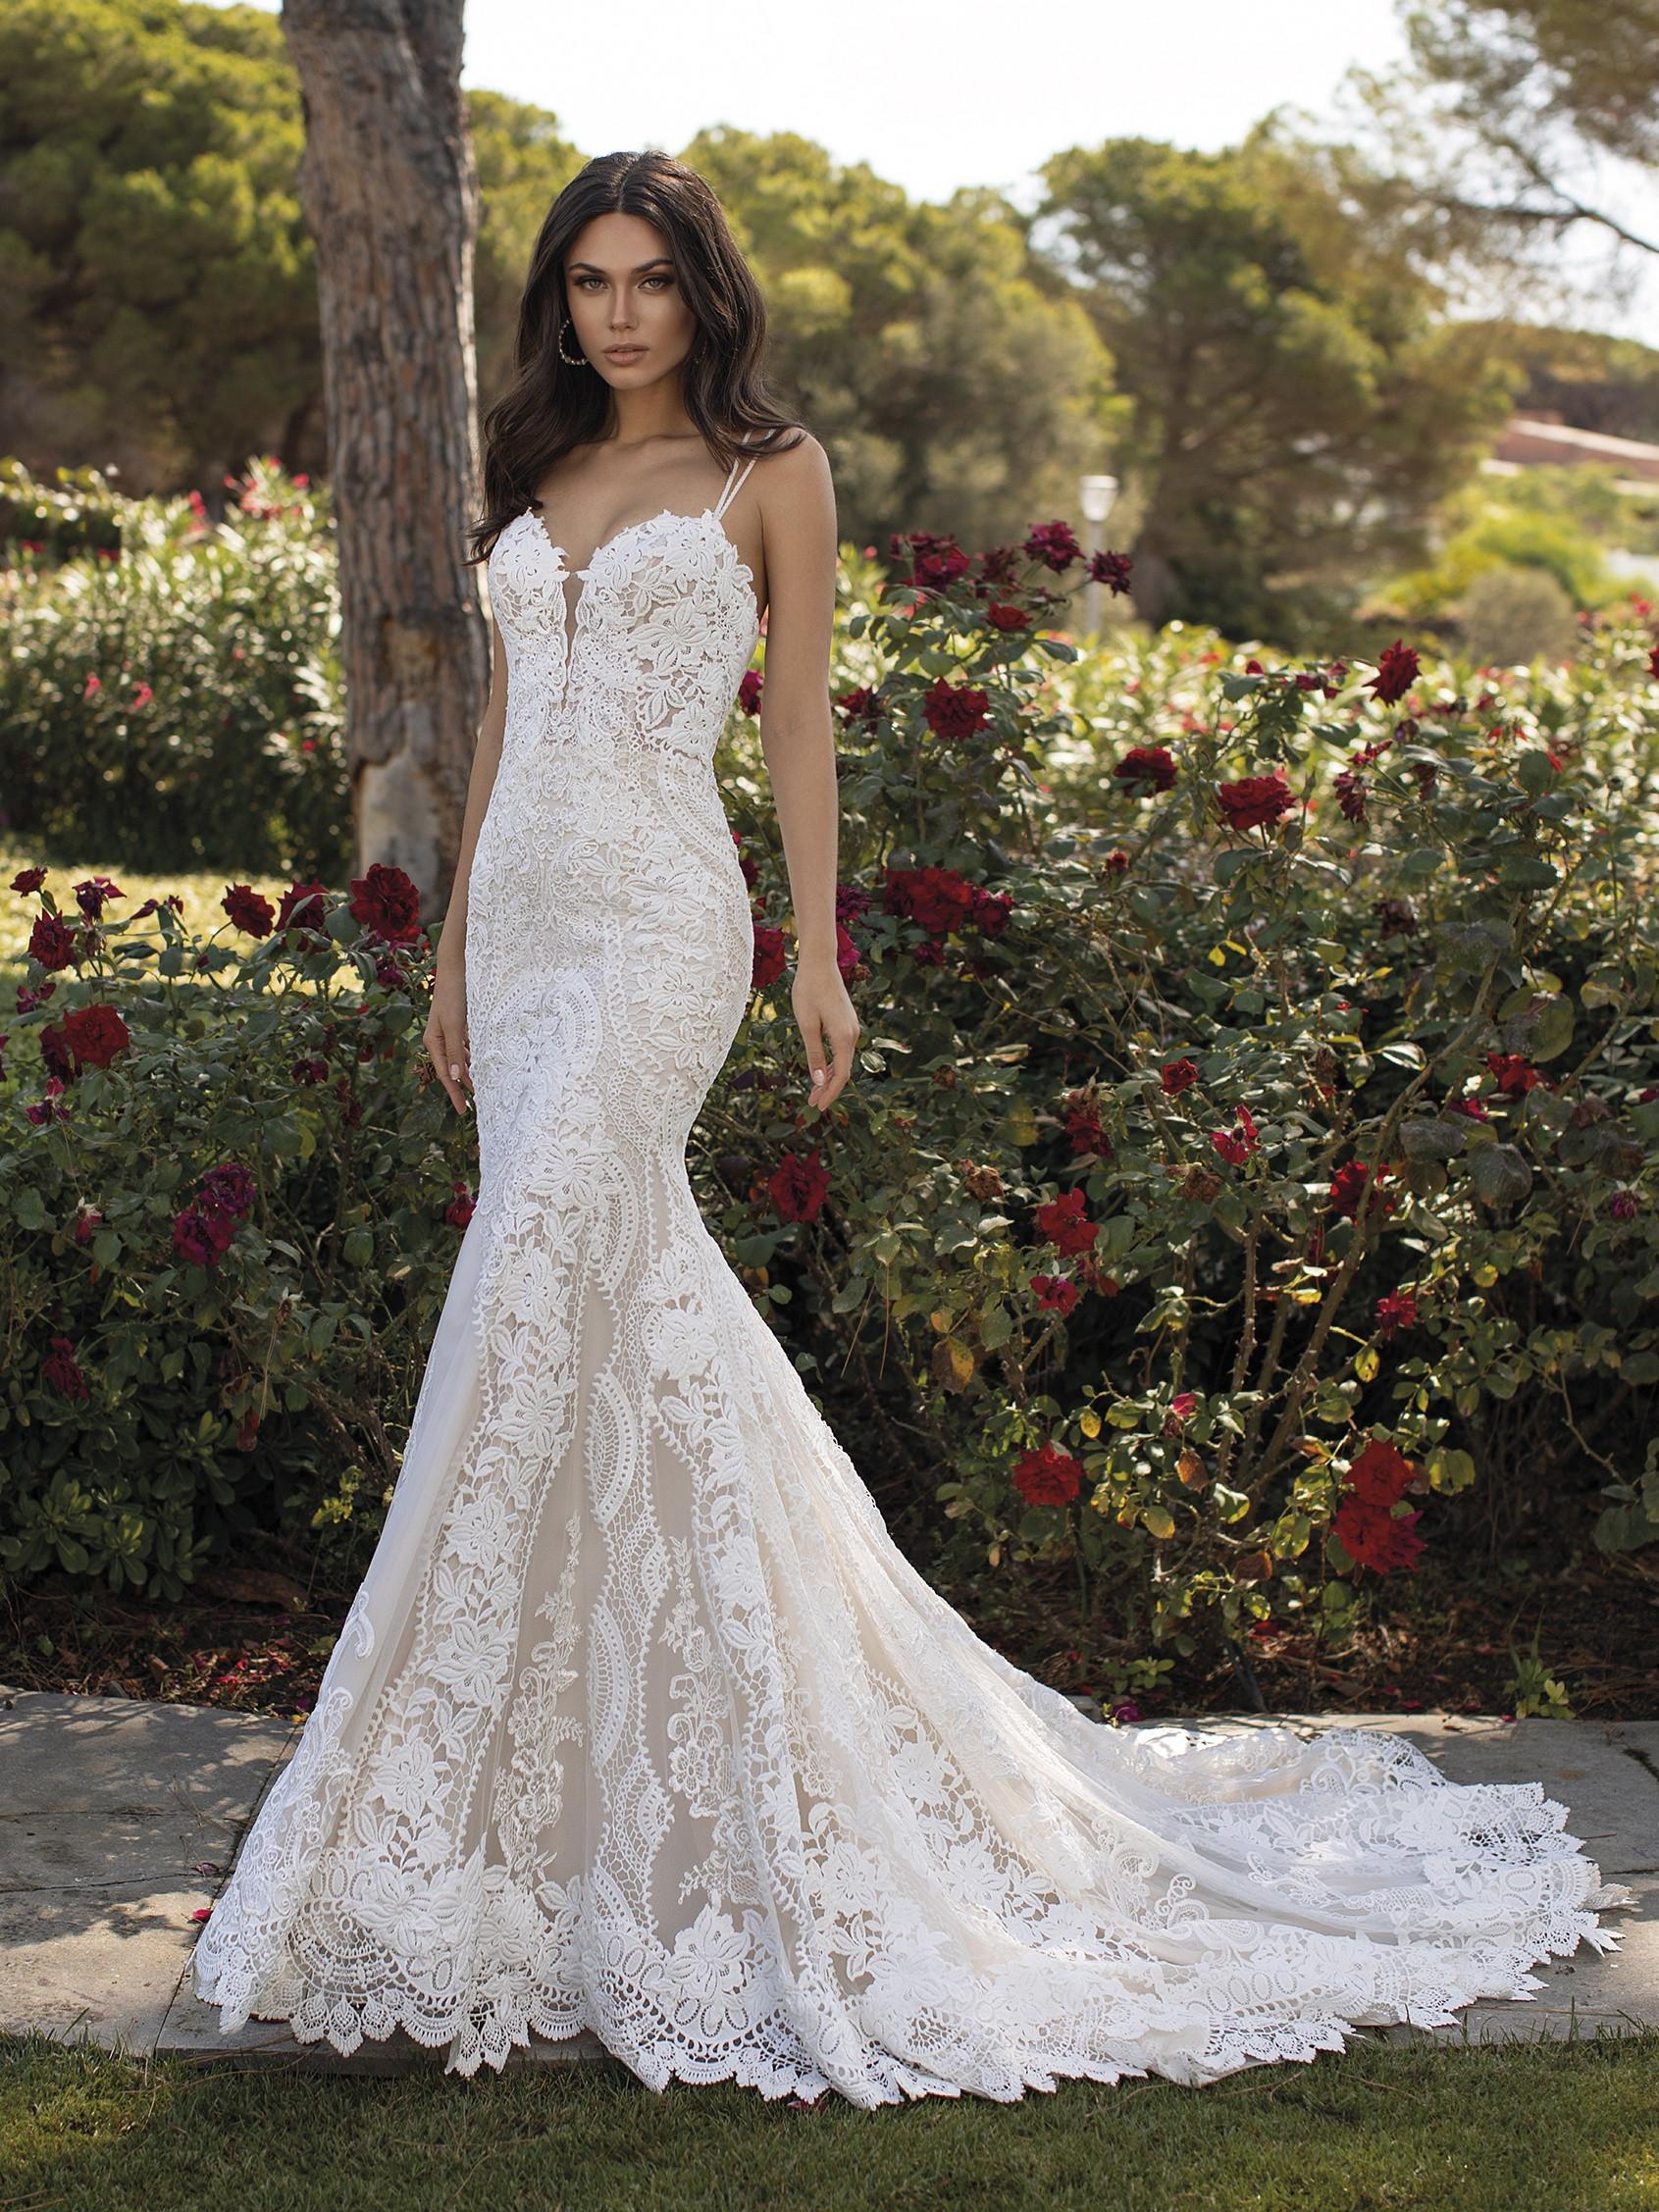 Floriana menyasszonyi ruha - Pronovias 2021